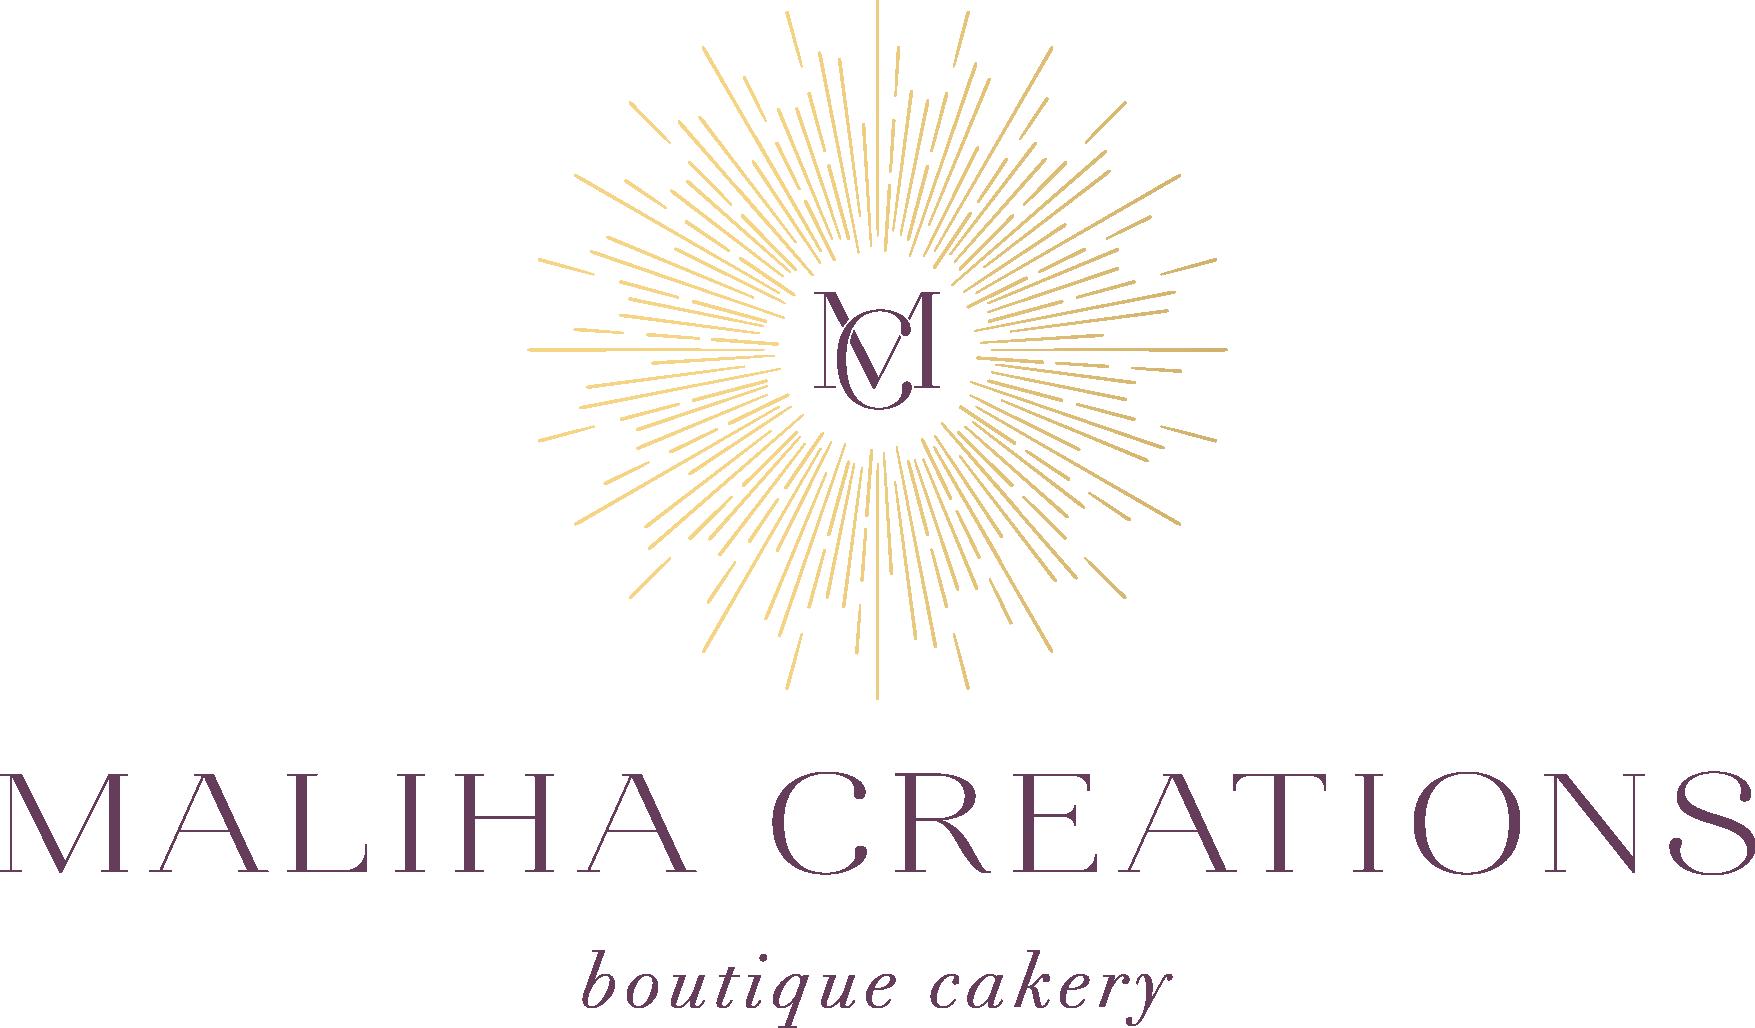 Maliha Creations